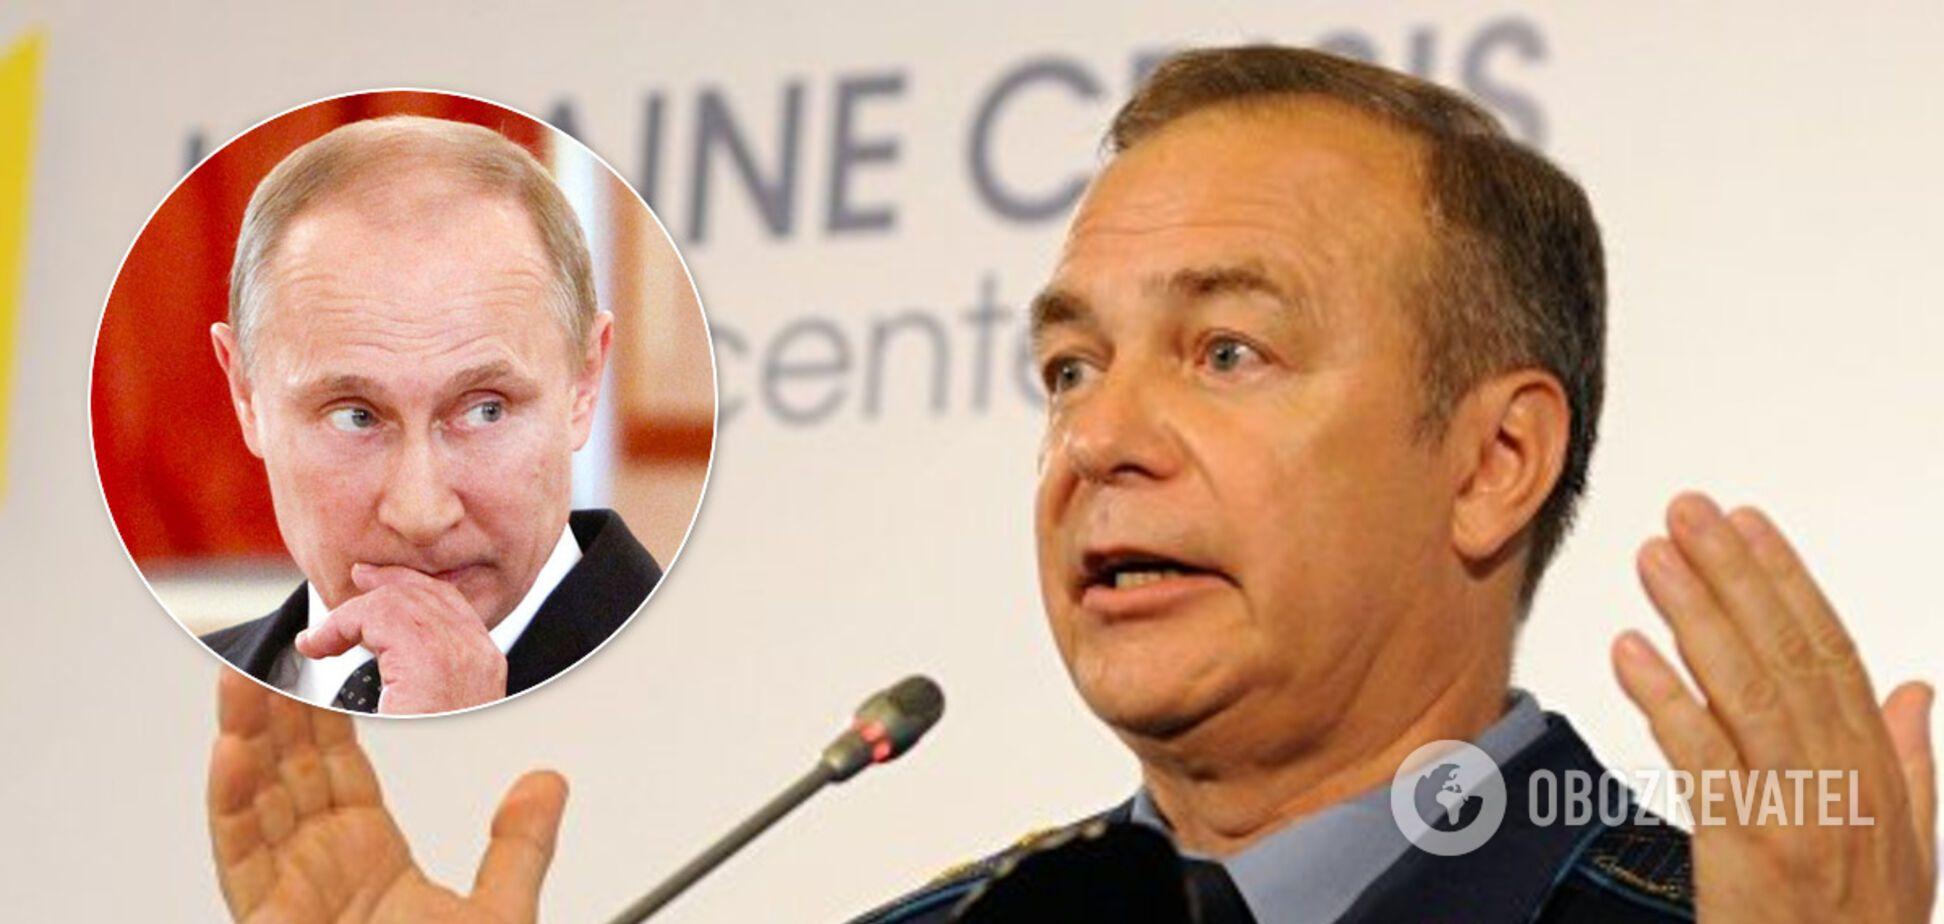 Путин готовил масштабный план захвата стран Балтии: что помешало